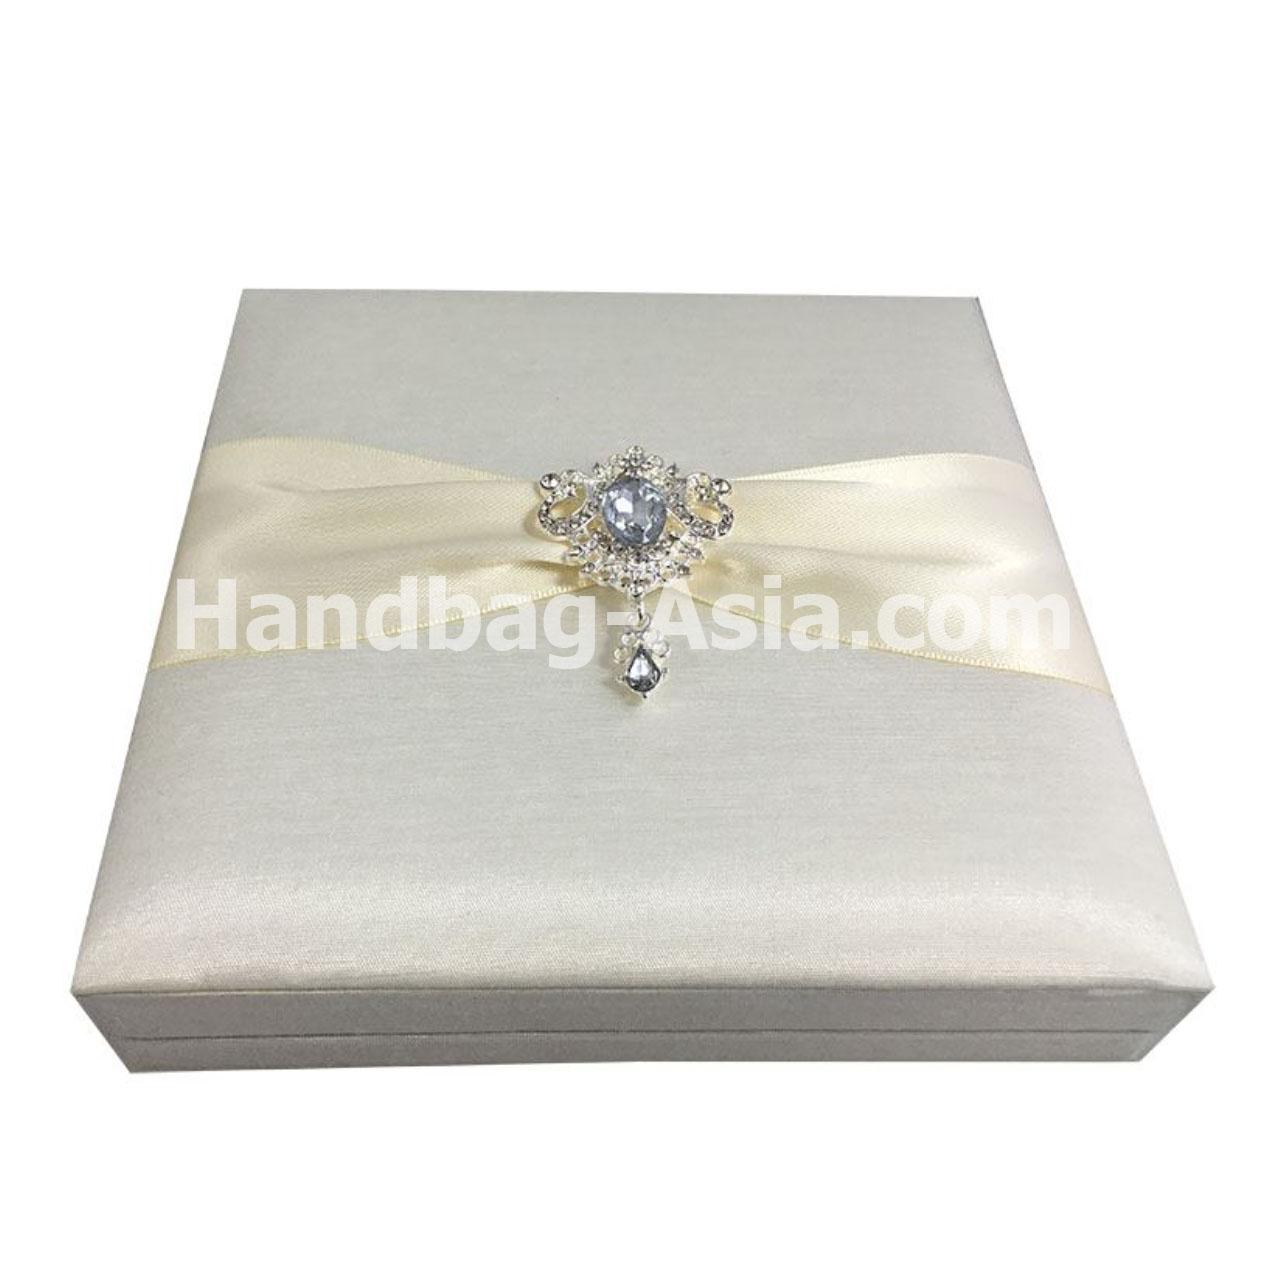 Luxury Boxed Wedding Invites With Rhinestone Brooch Embellishment ...